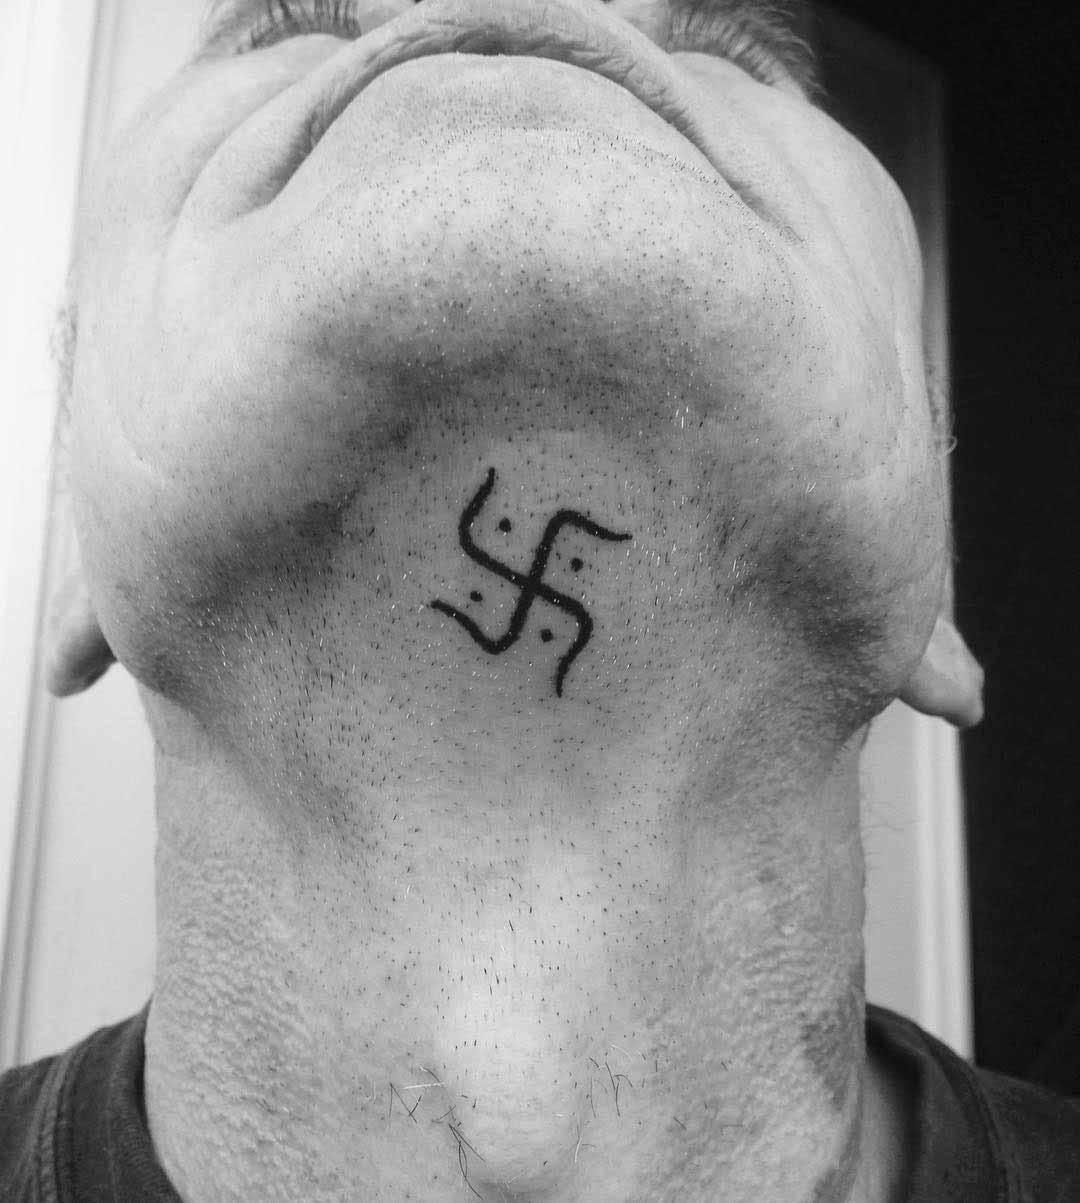 Swastika Tattoo Under The Chin by satans_vandal_handpoked_tattoo